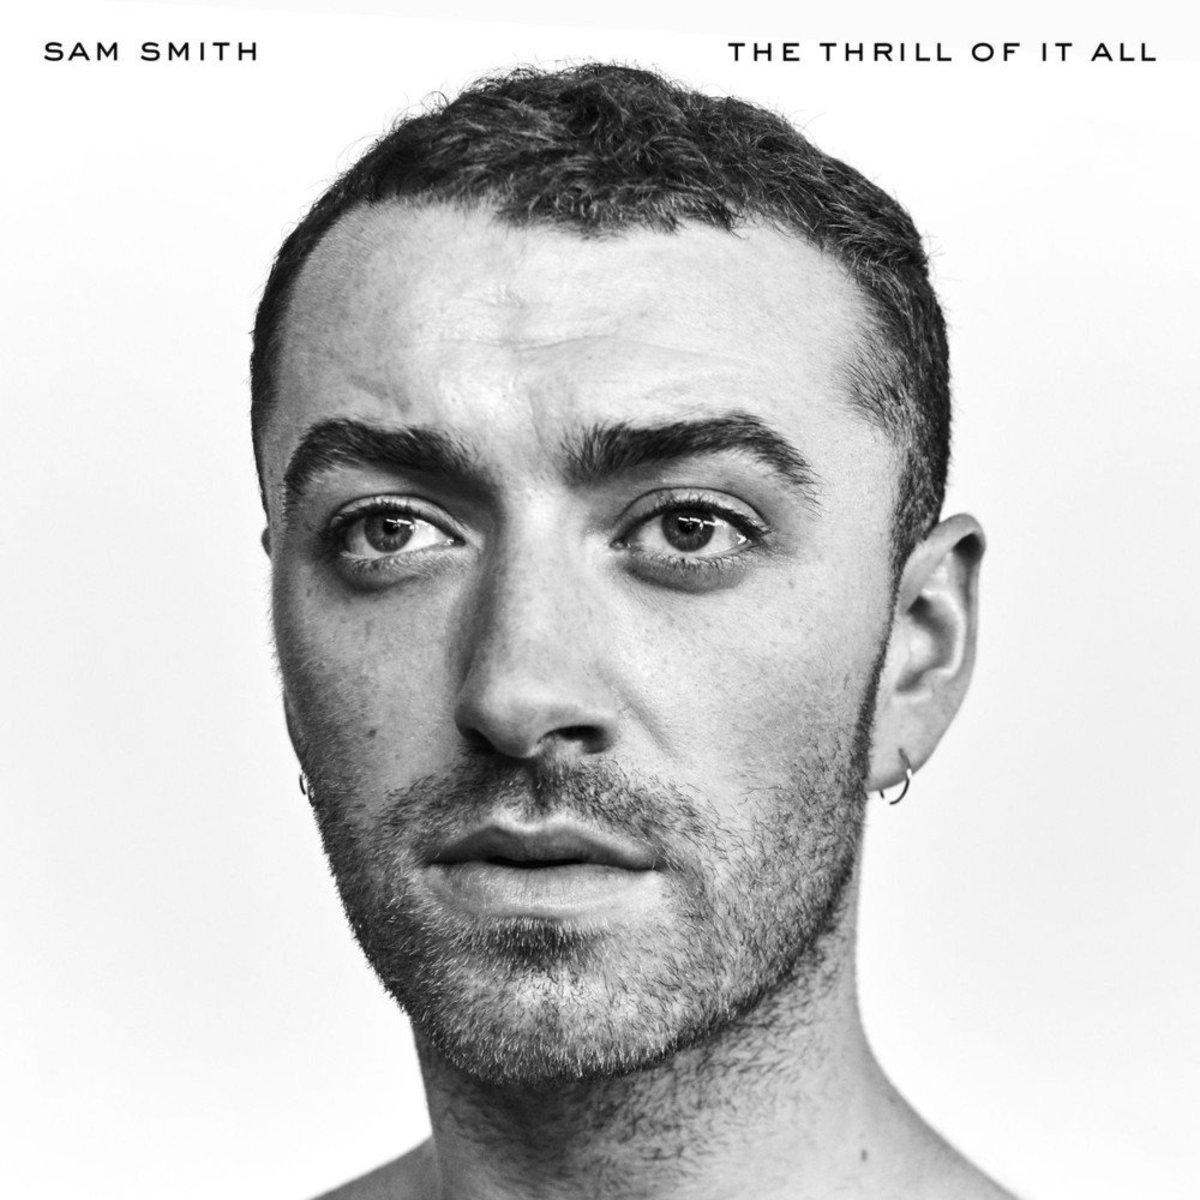 Sam Smith - Thrill of It All Album Cover